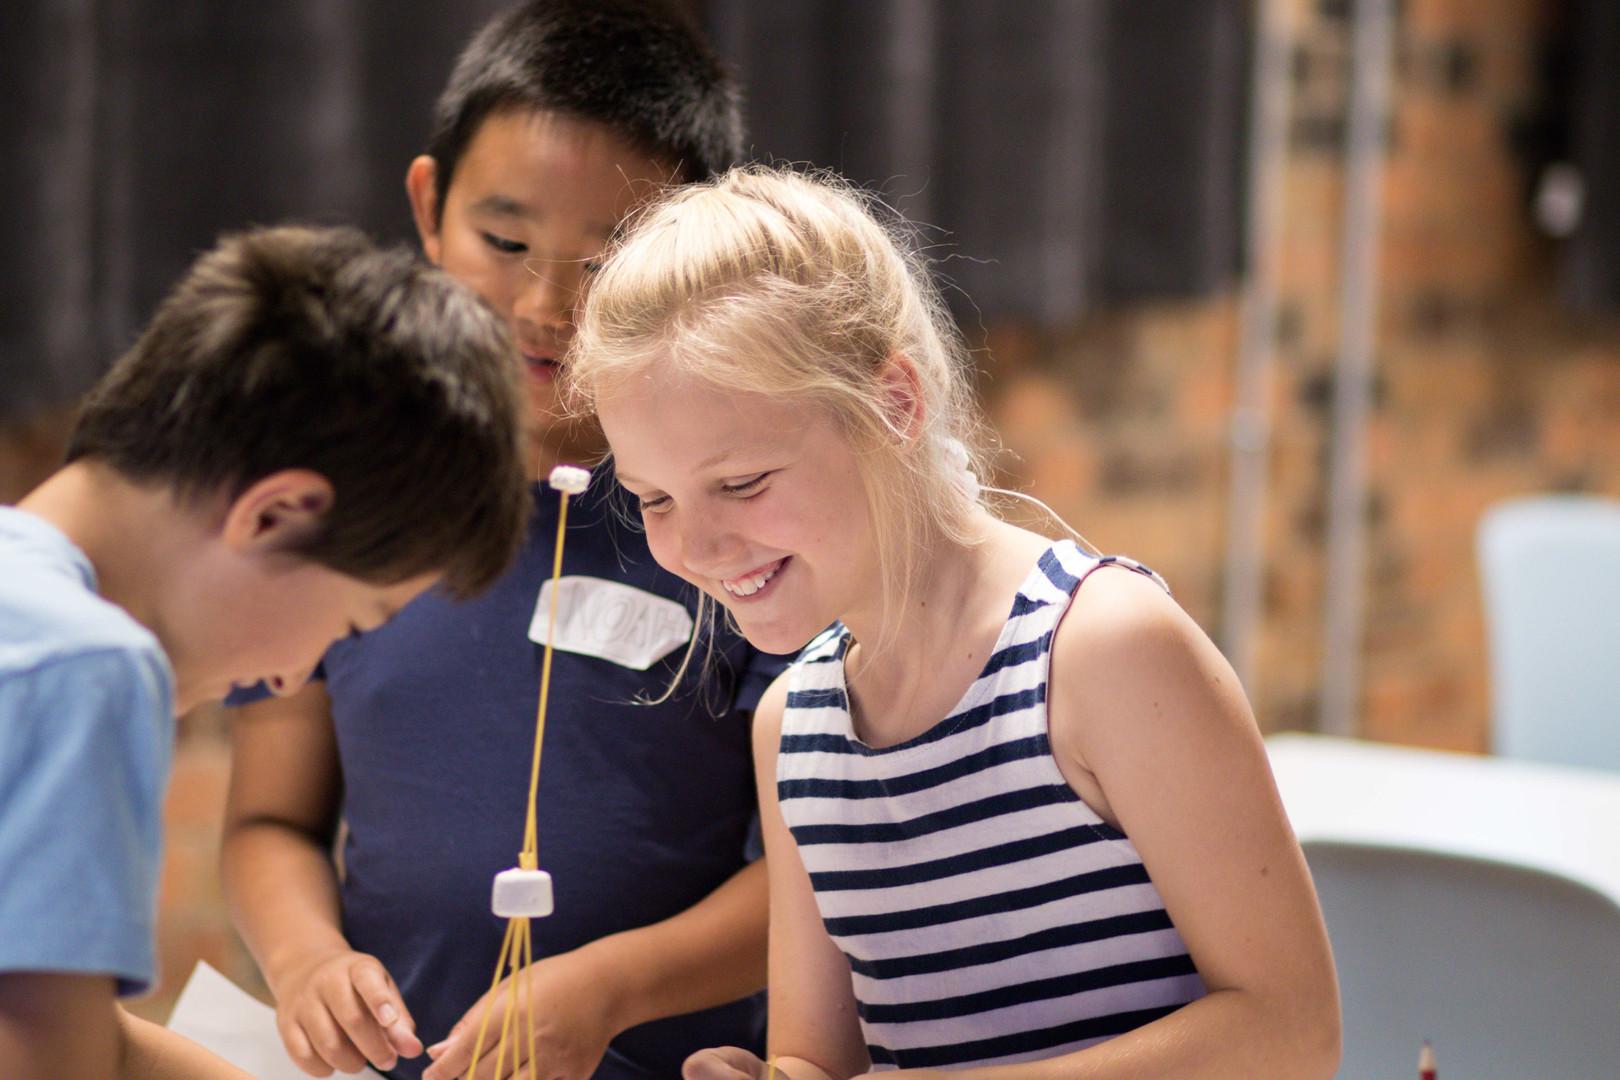 Students Building Their Idea